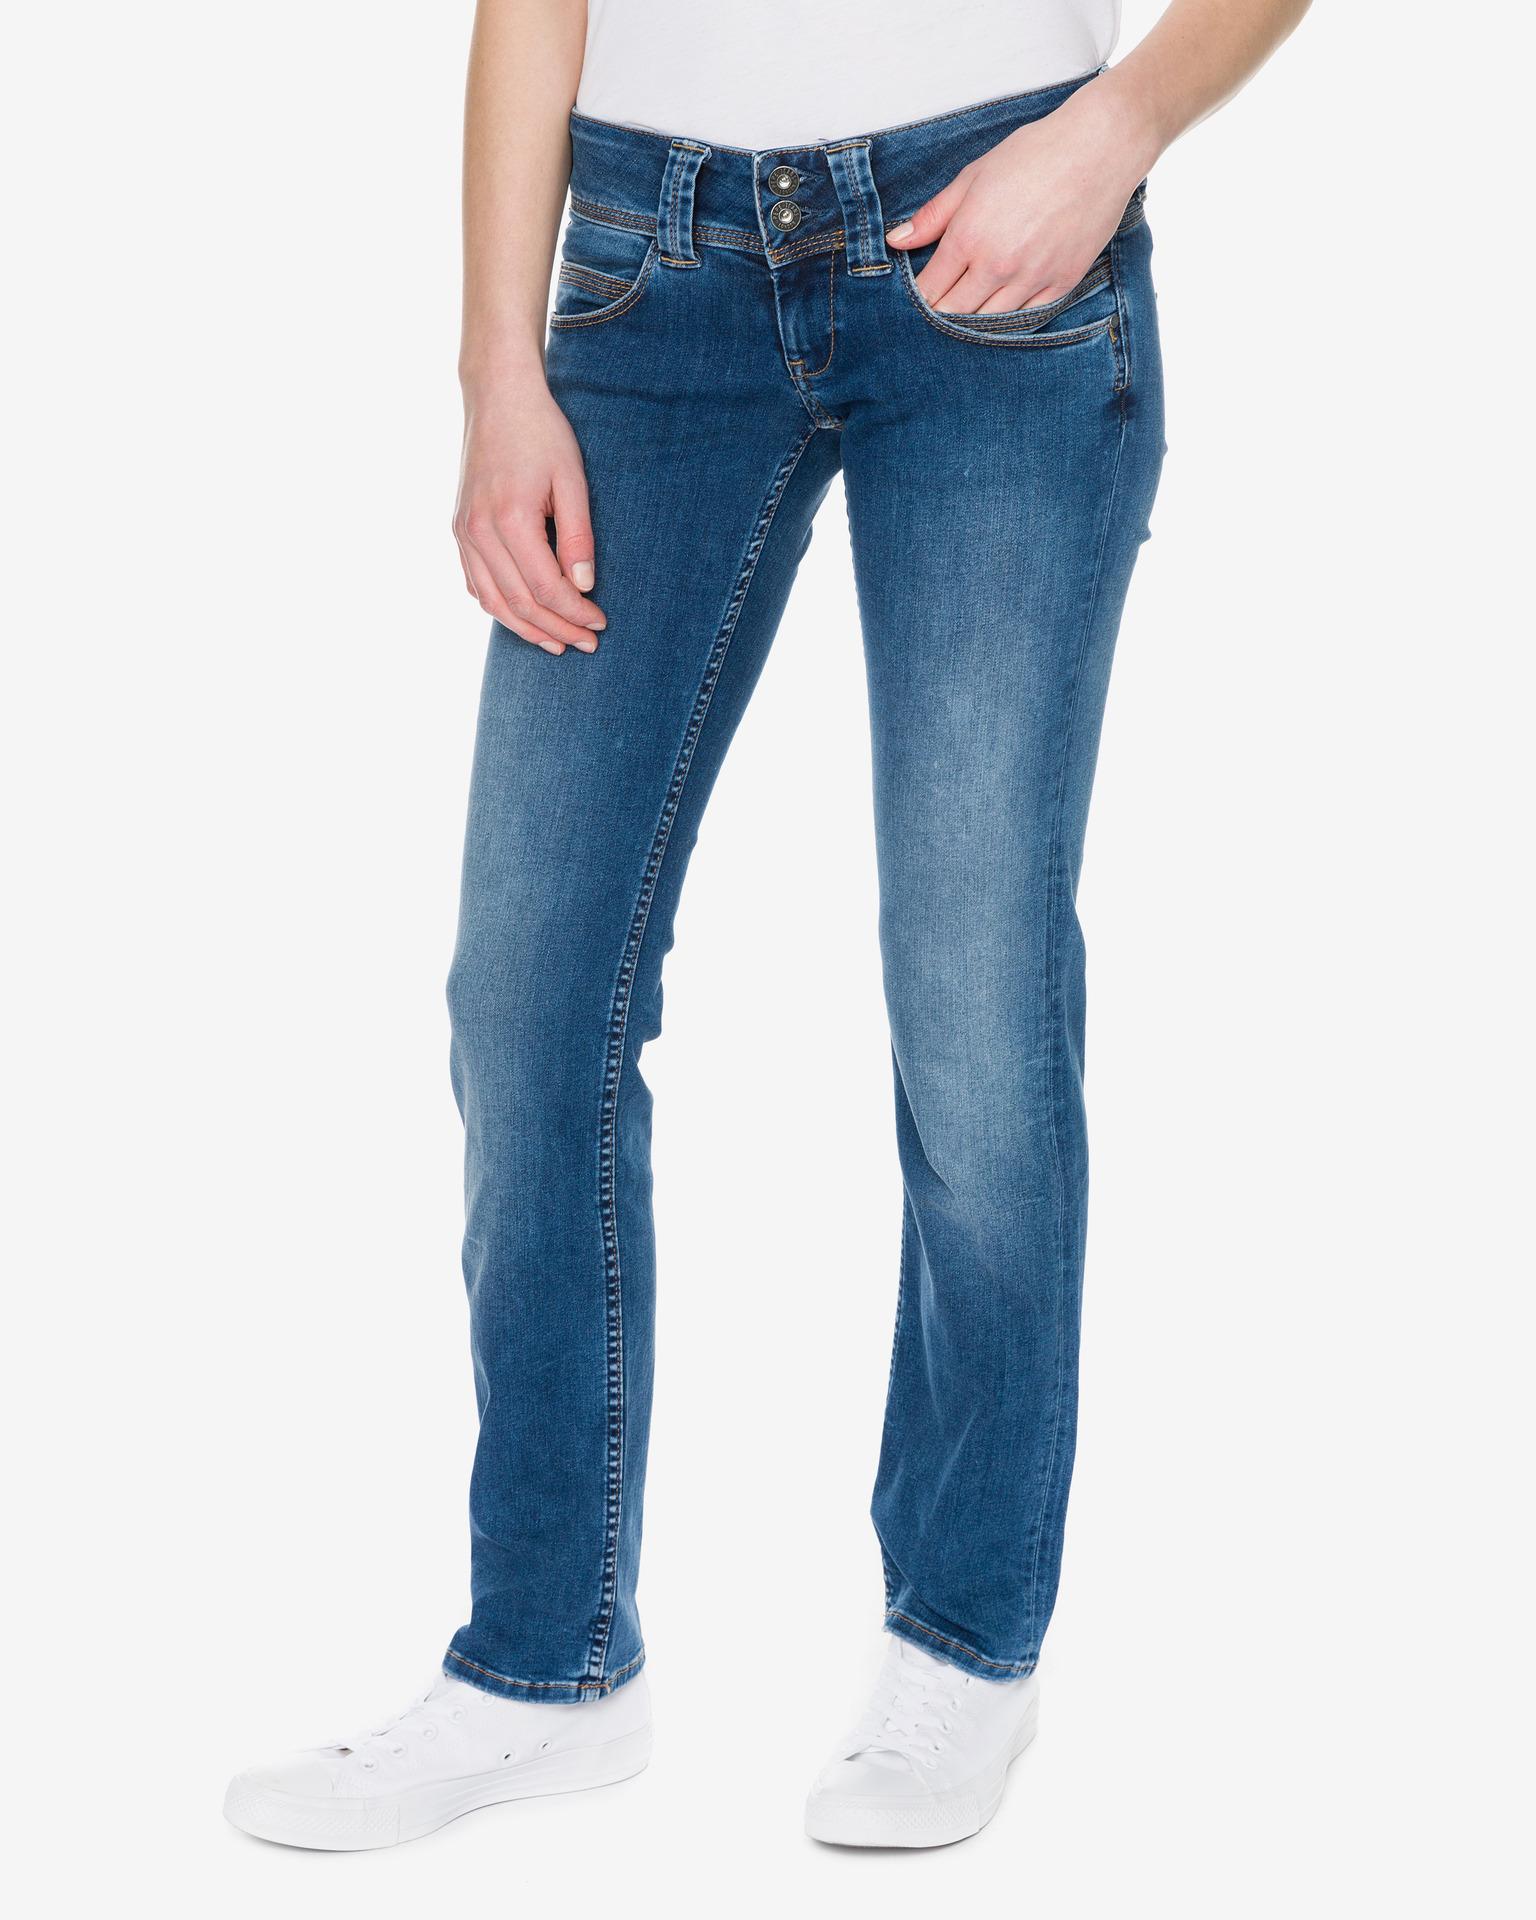 f8c7ab56bdd Pepe Jeans - Venus Jeans Bibloo.com